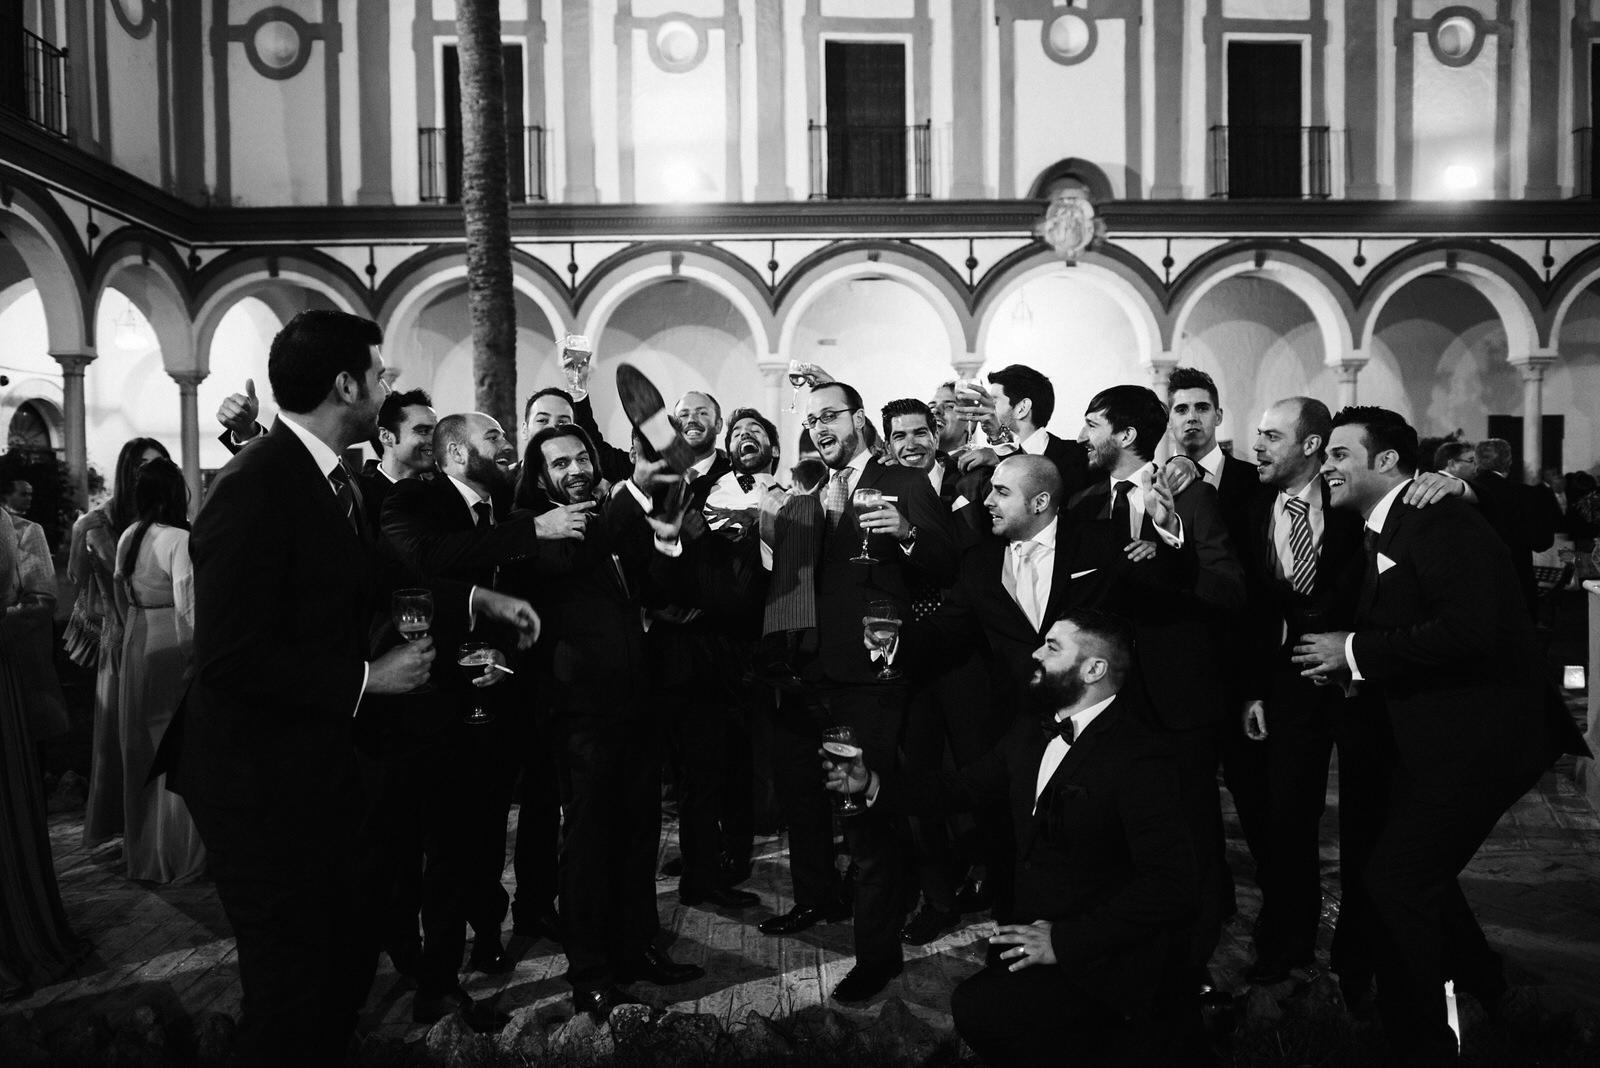 fotografo de bodas sevilla - fotografo boda - fotografía sevilla - Andrés AmarilloAAA_3407- fine.JPG